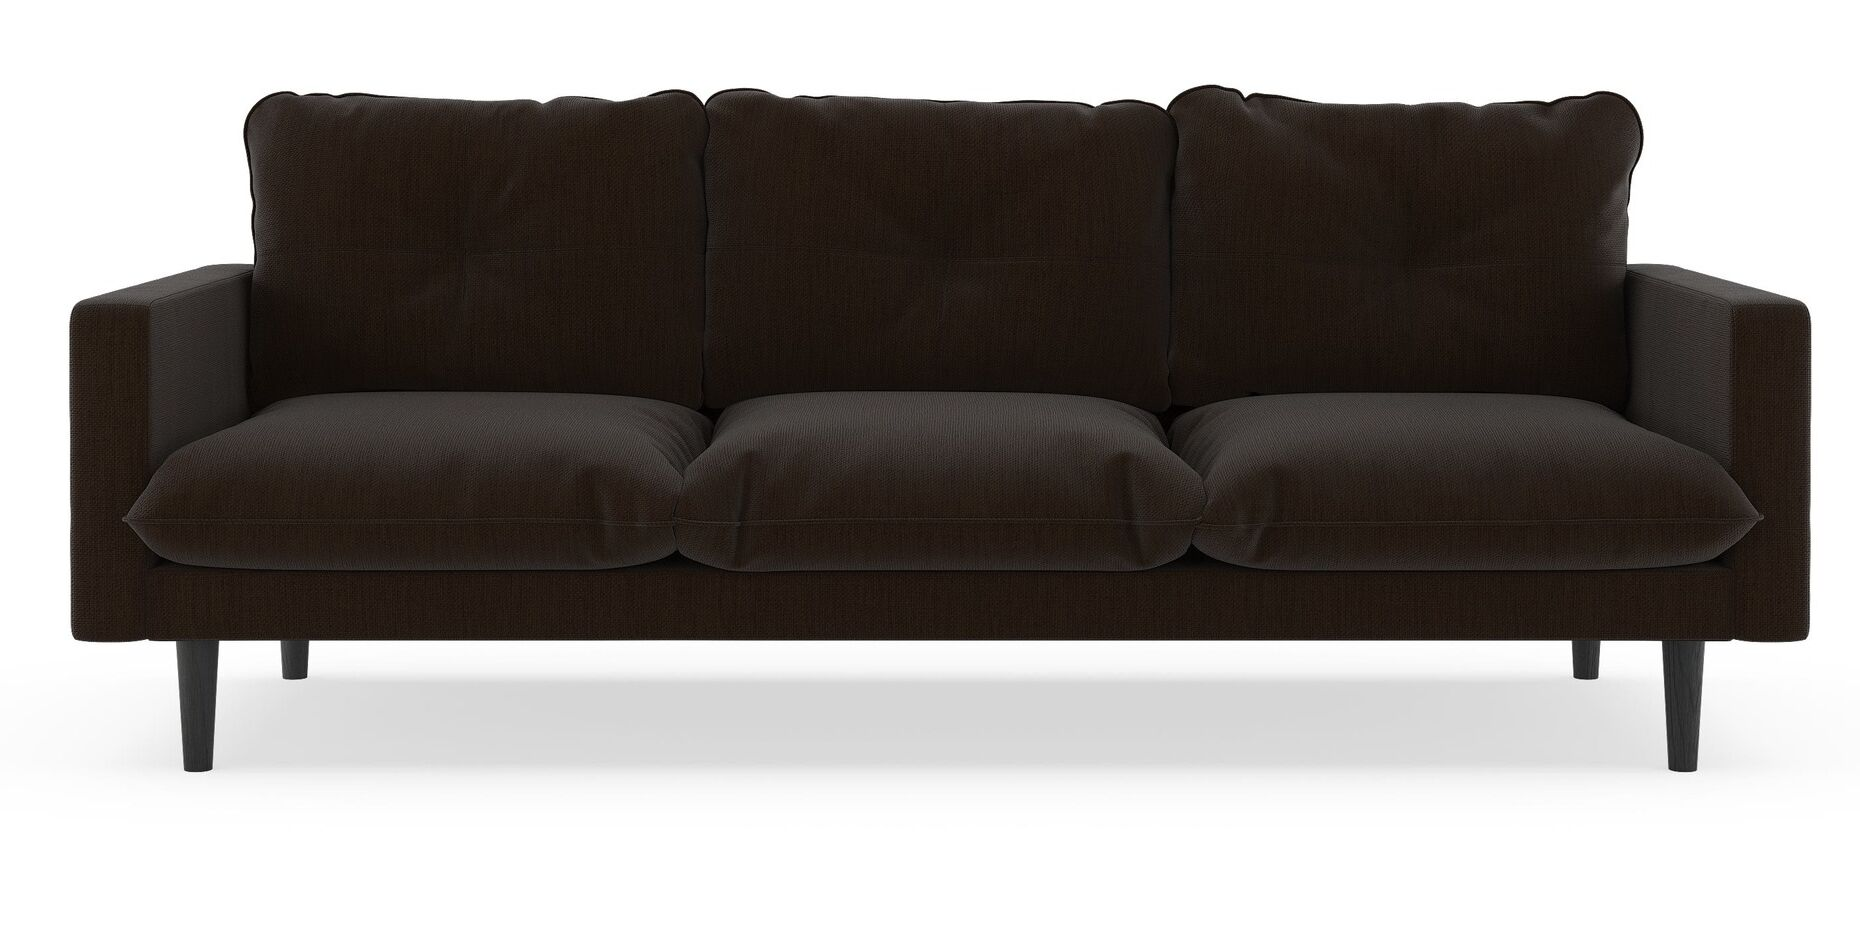 Scheidt Satin Weave Sofa Finish: Black, Upholstery: Slate Gray